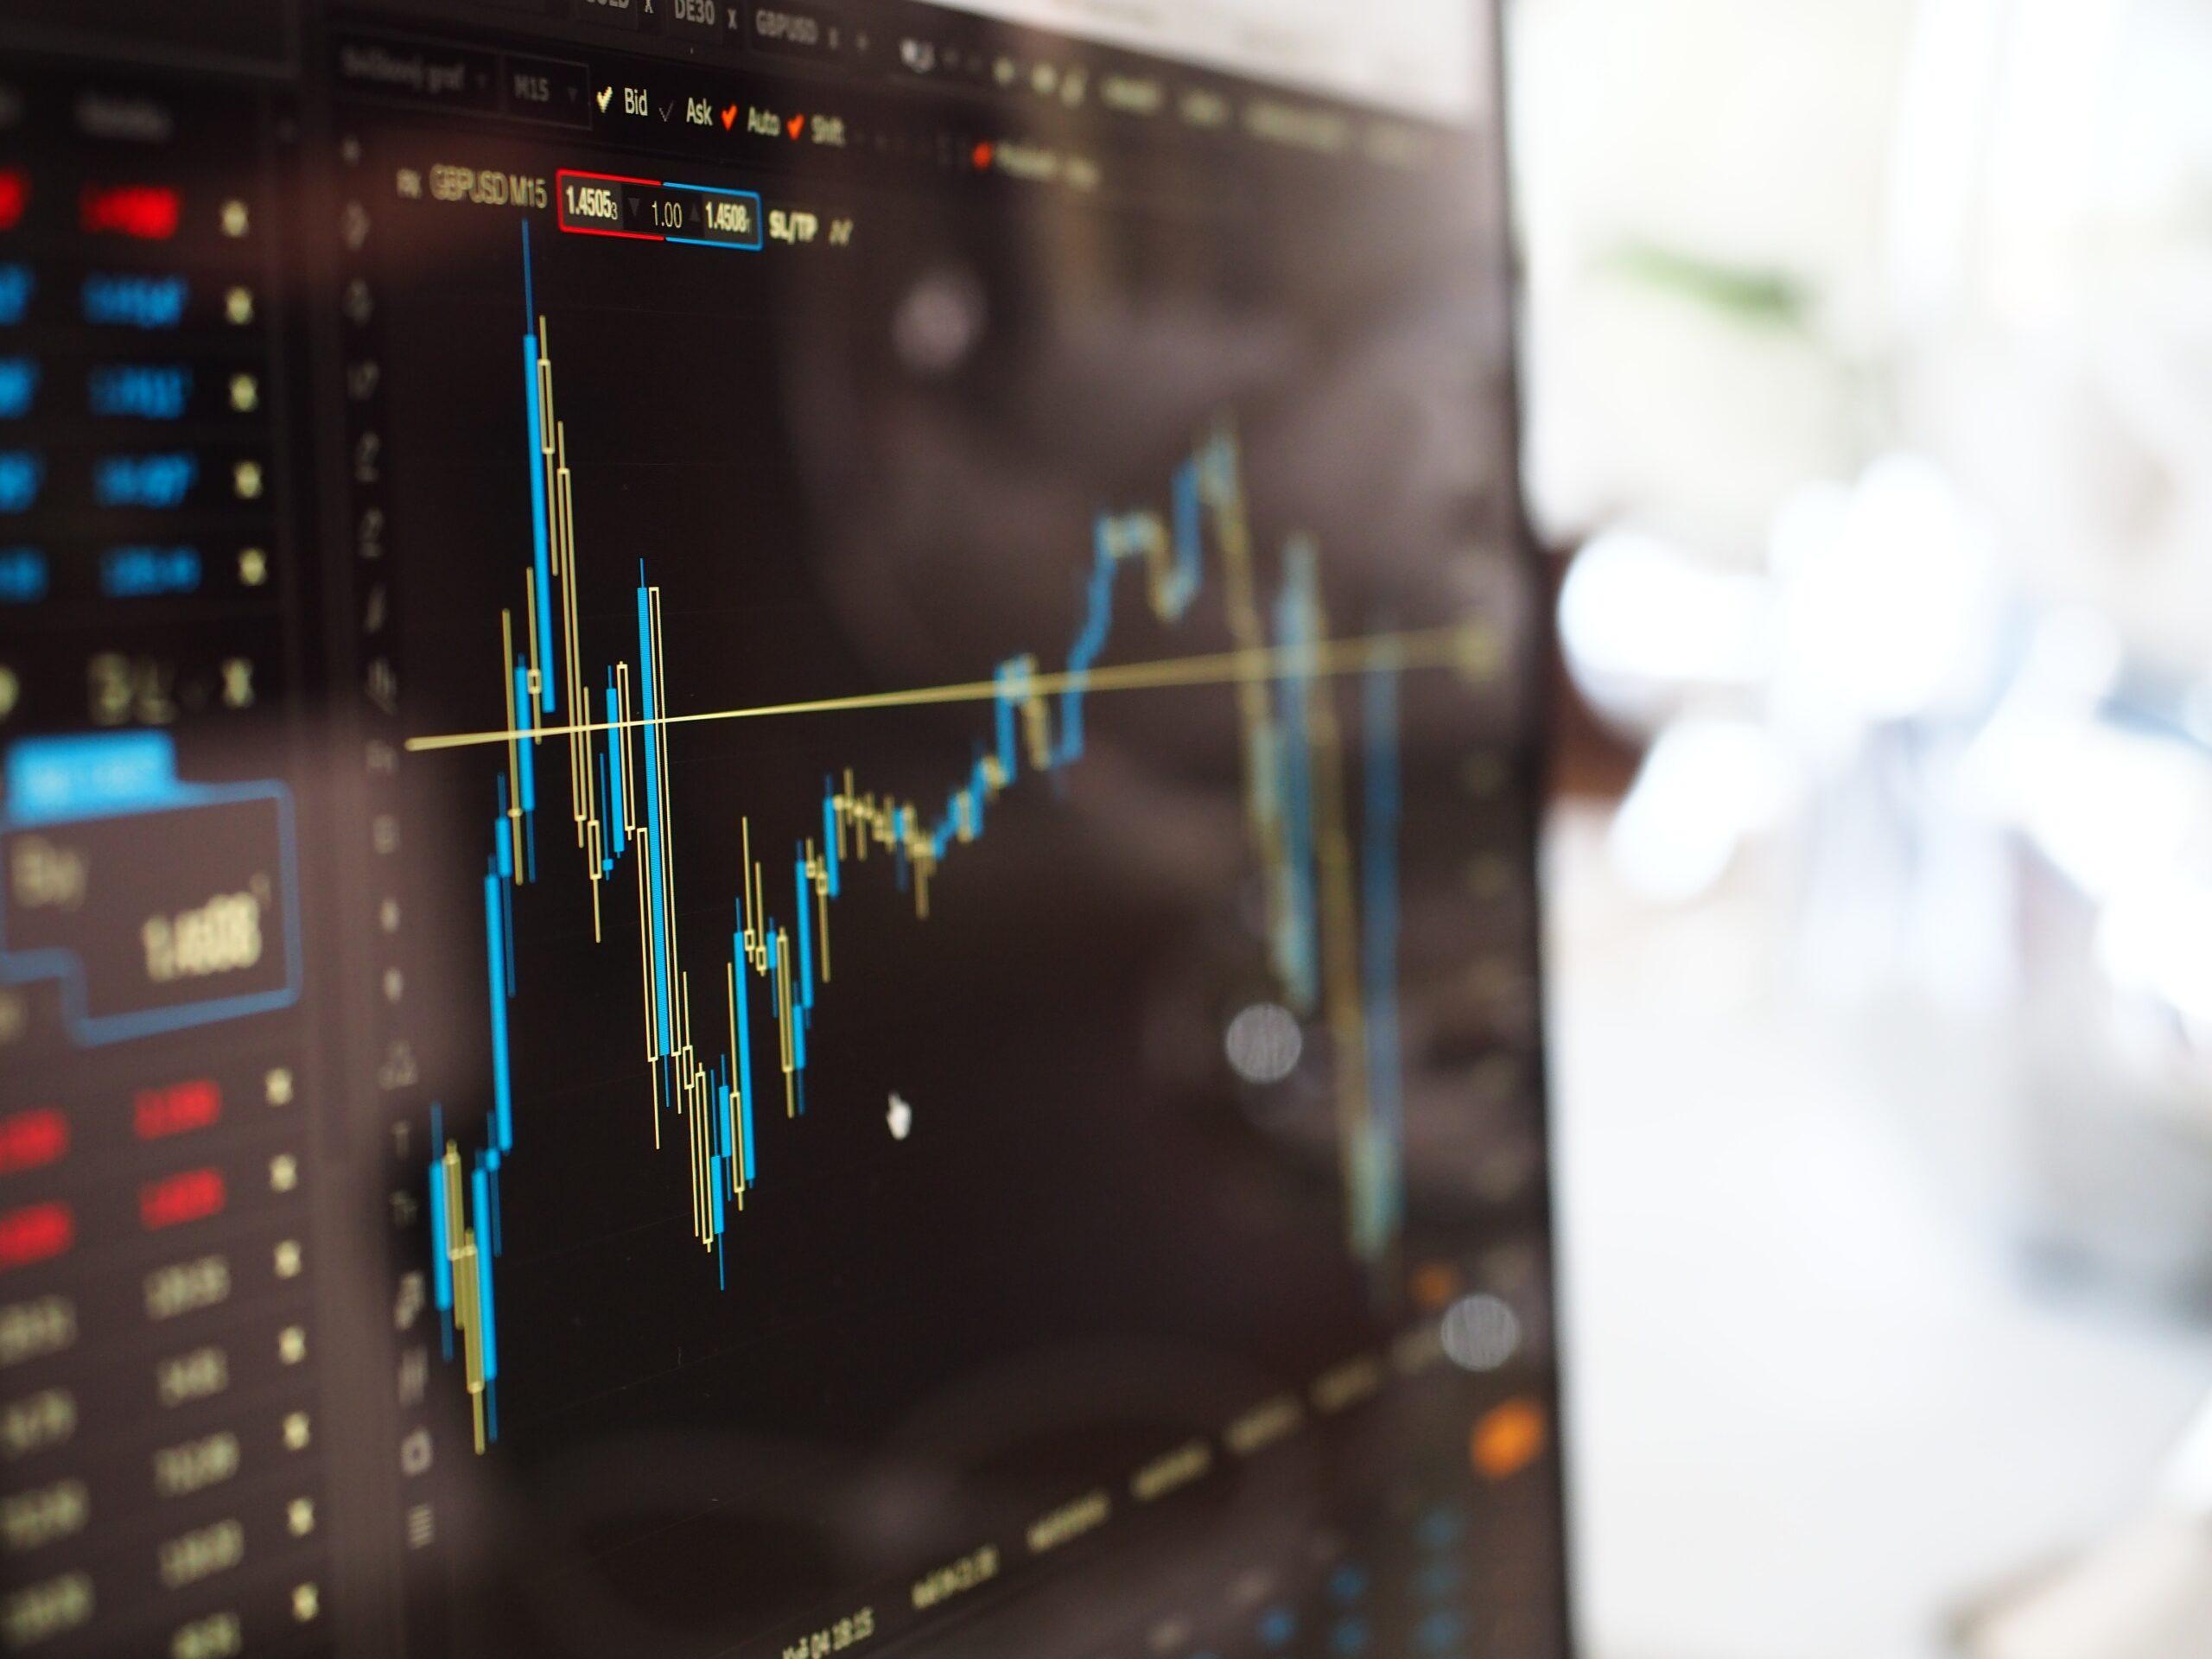 Tecnologia e trading – o que mudará no futuro?